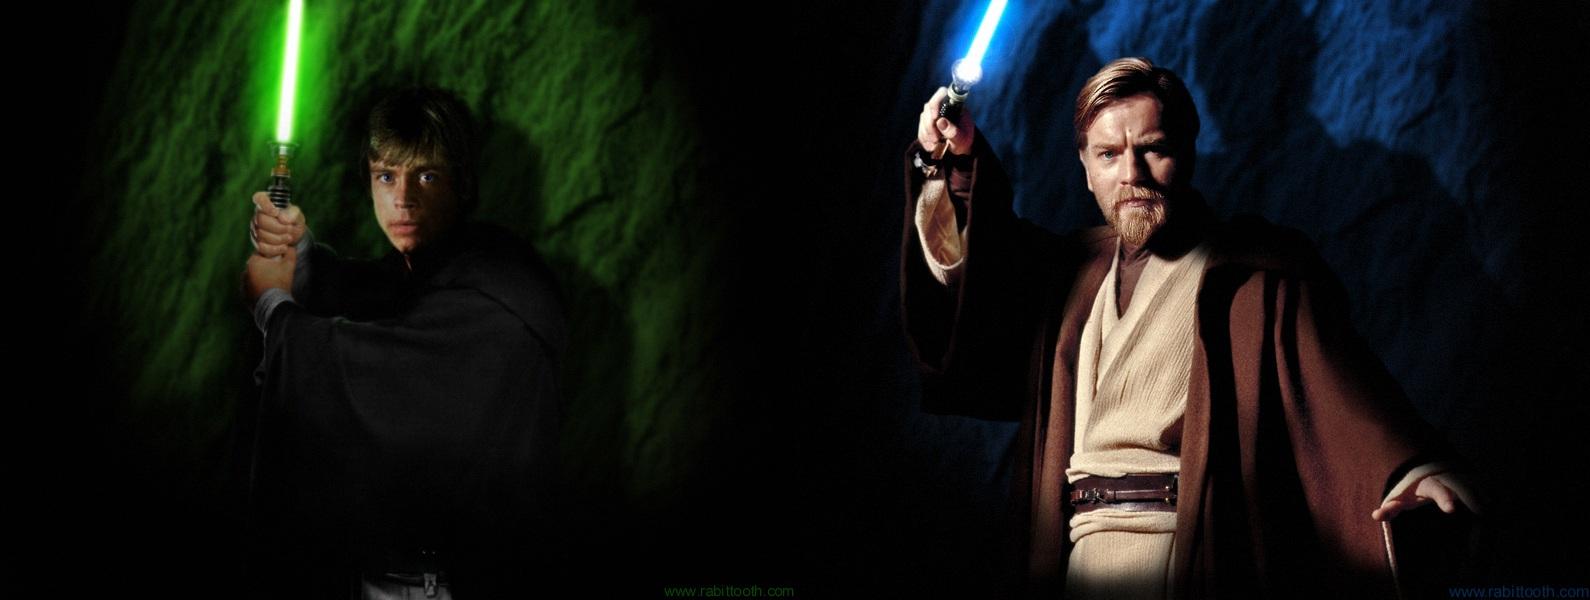 Luke Skywalker Wallpaper Hd Res Luke Skywalker And Obi Wan 1590x600 Wallpaper Teahub Io